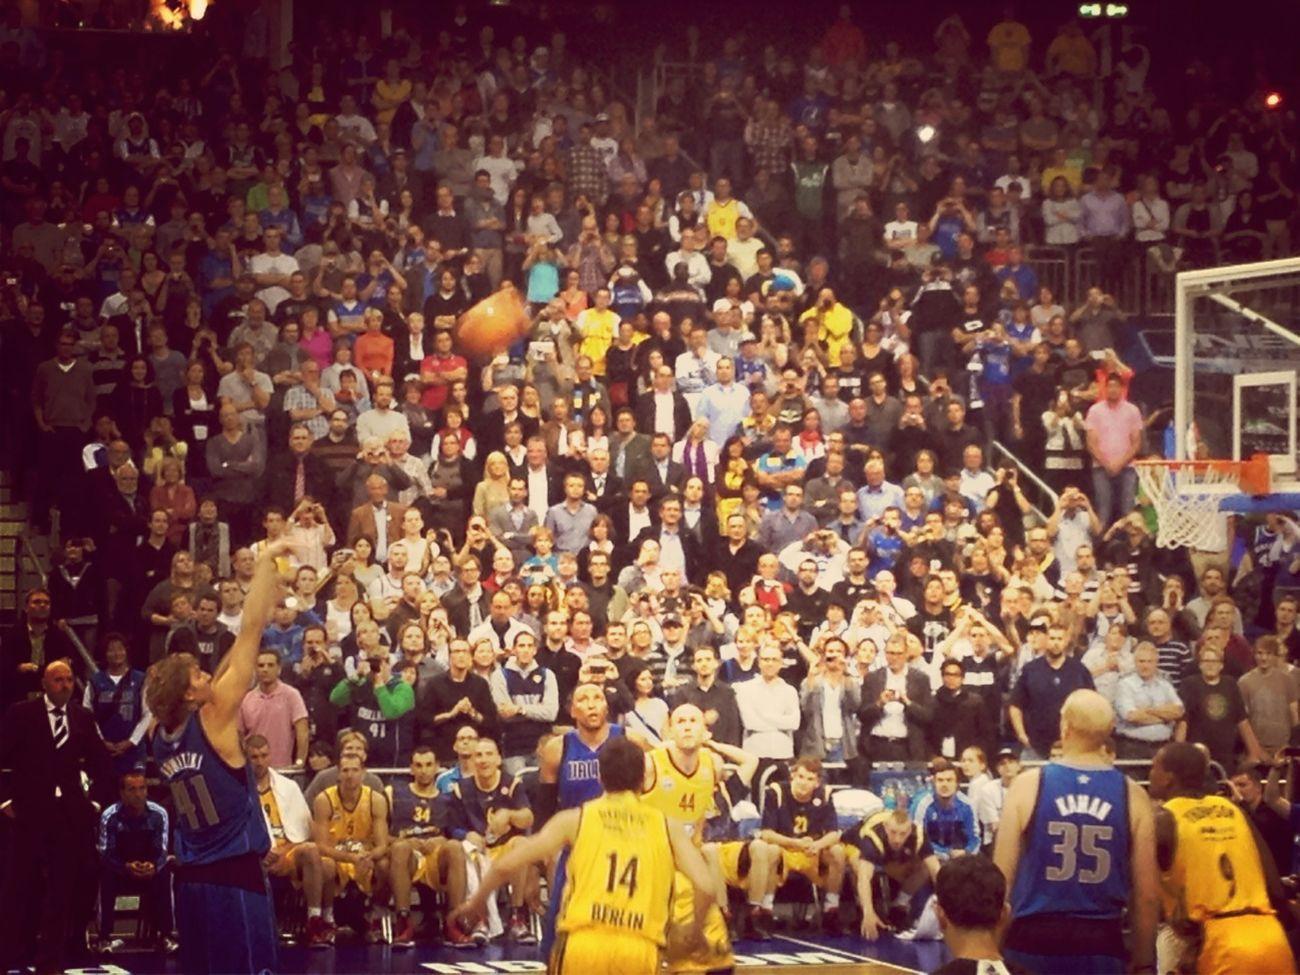 Dirk closing